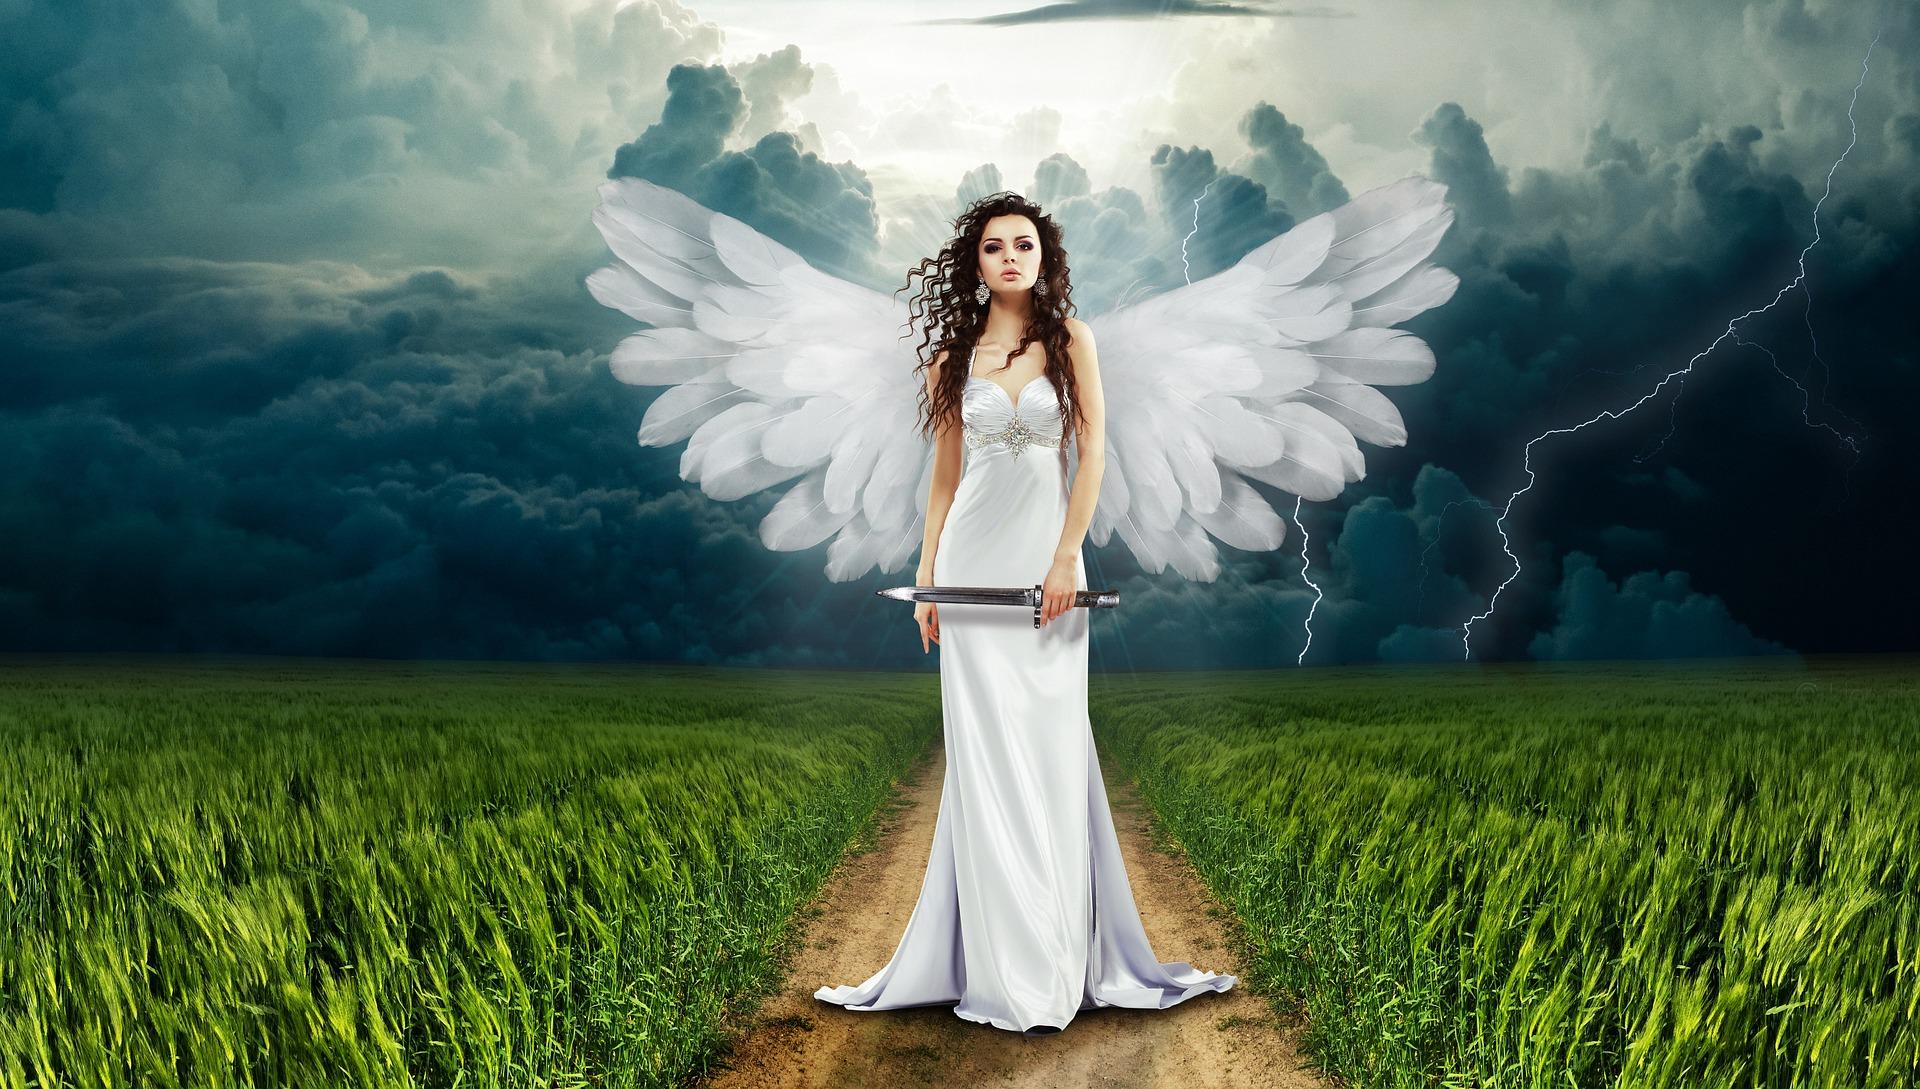 天使, 女性, 短剣, 翼, 雲 - HD の壁紙 - 教授-falken.com